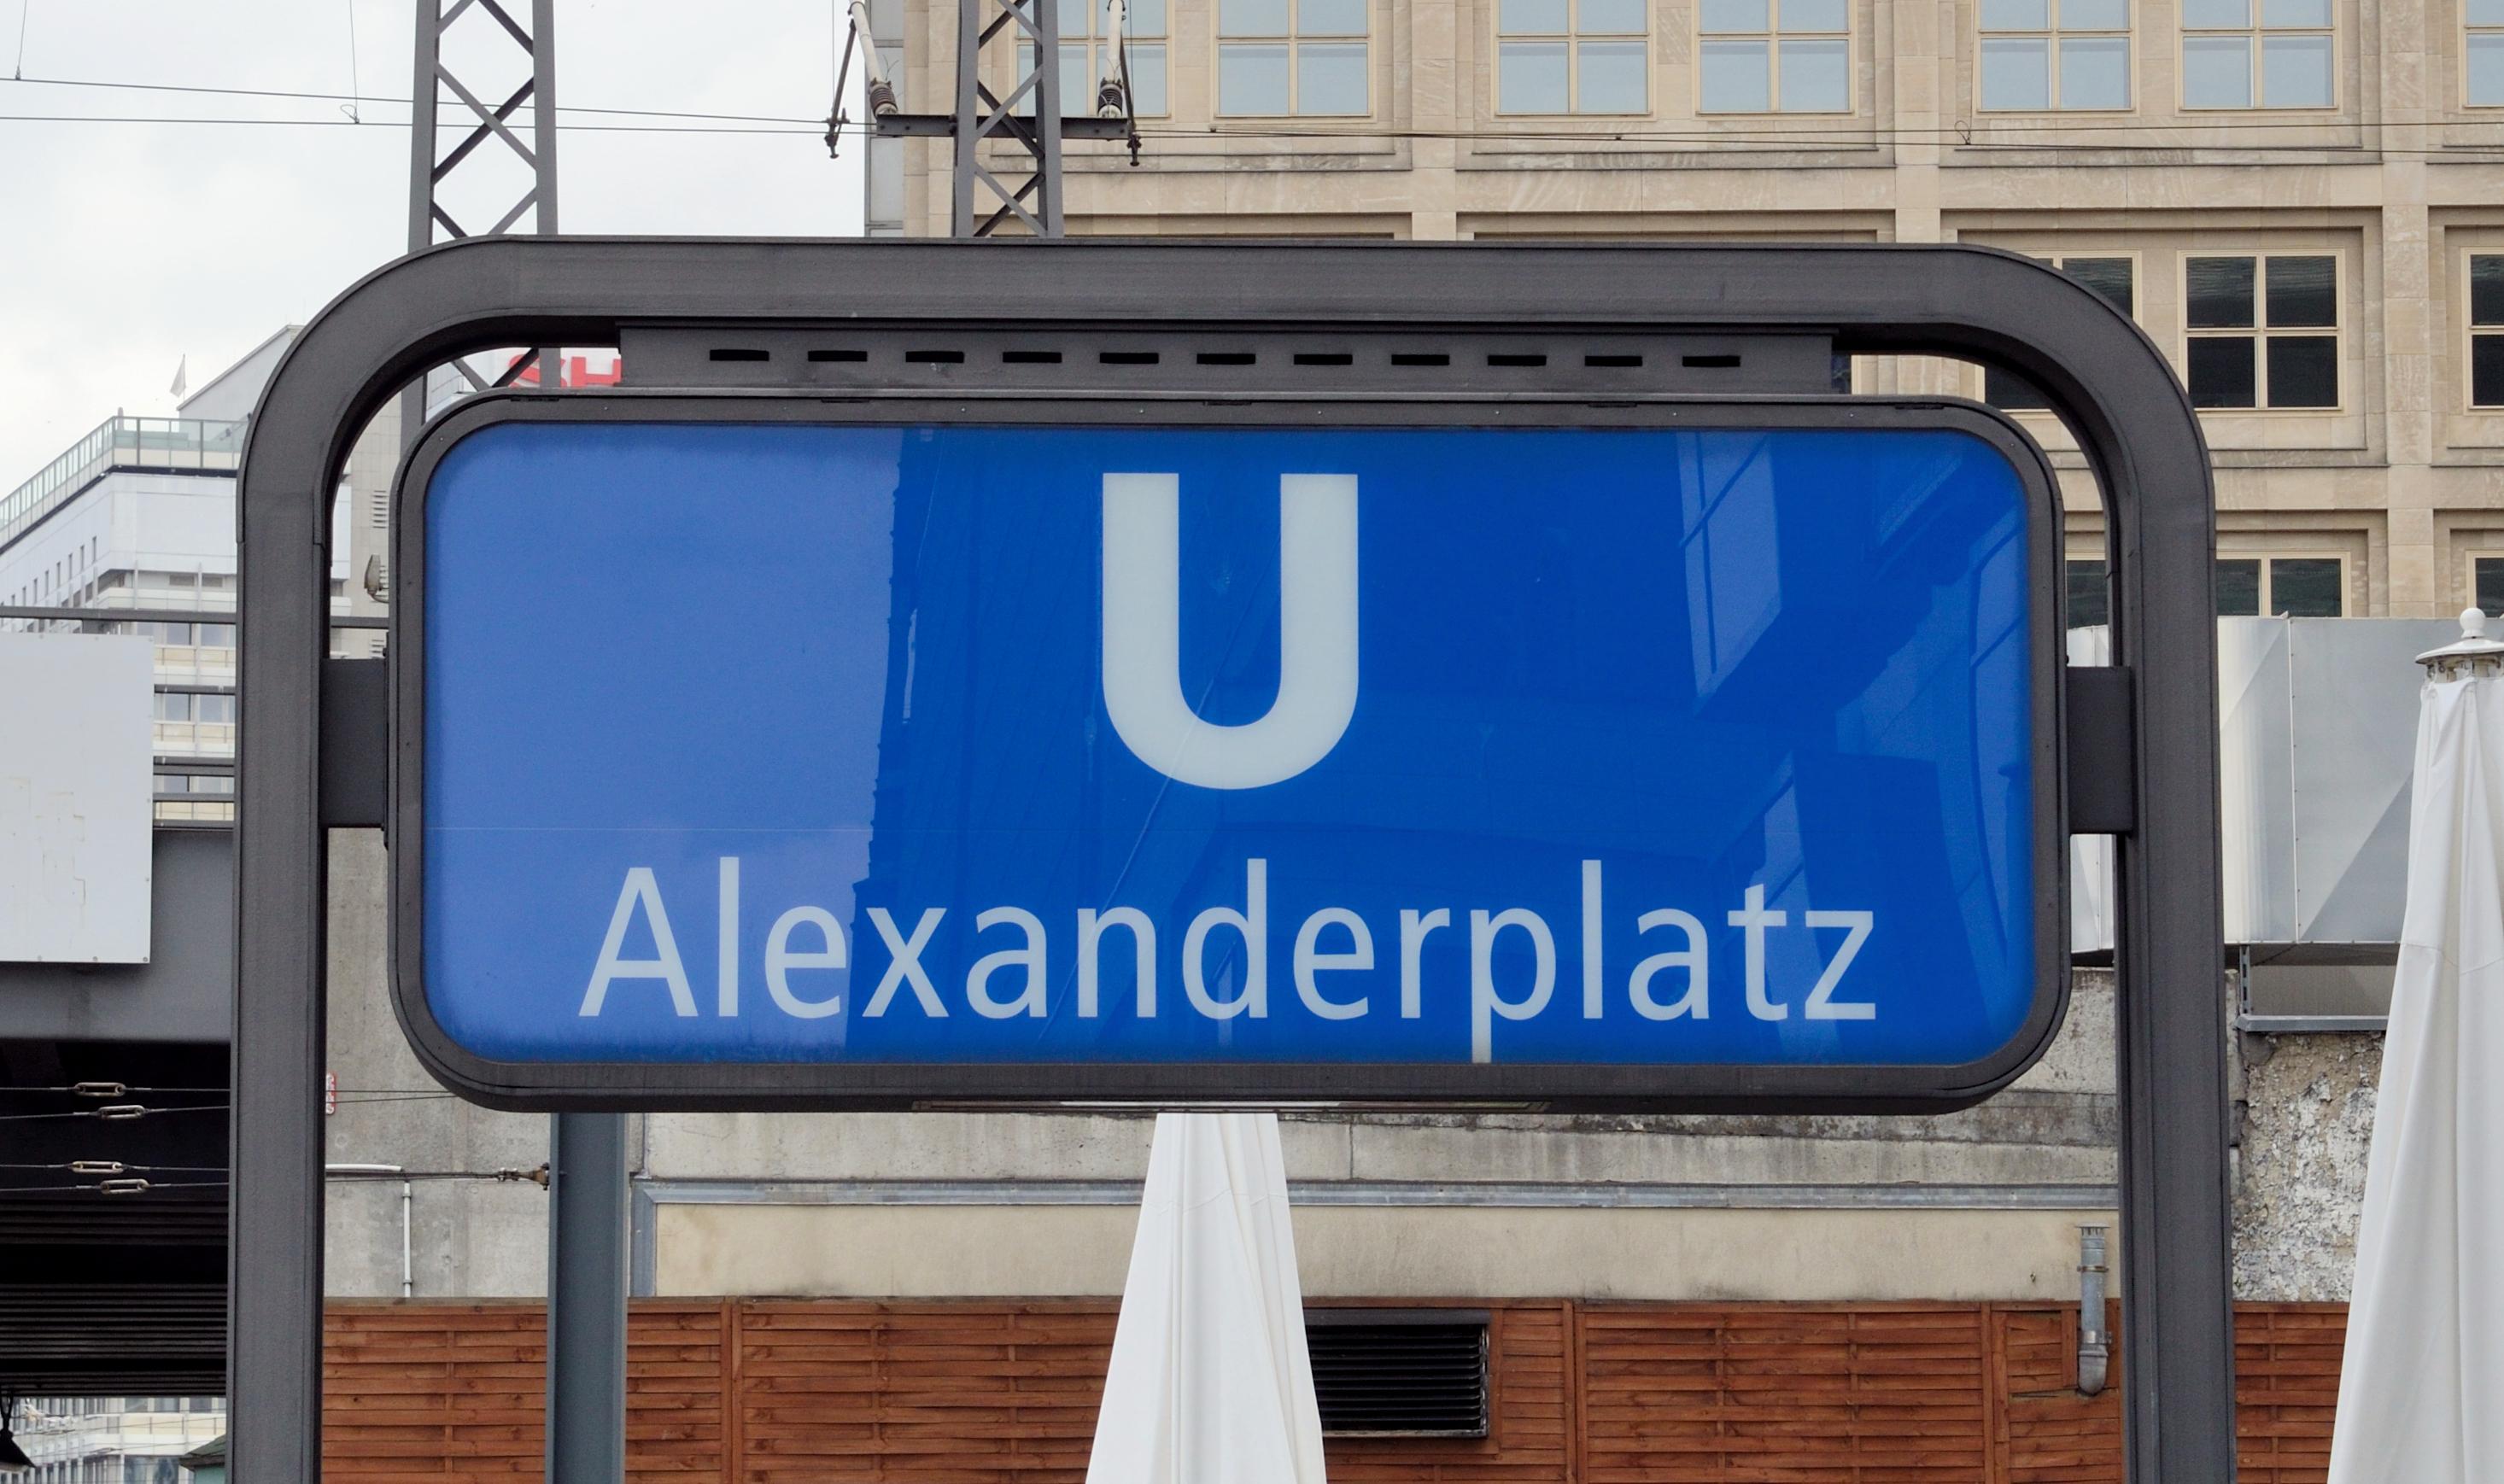 u bahnhof alexanderplatz rome - photo#36